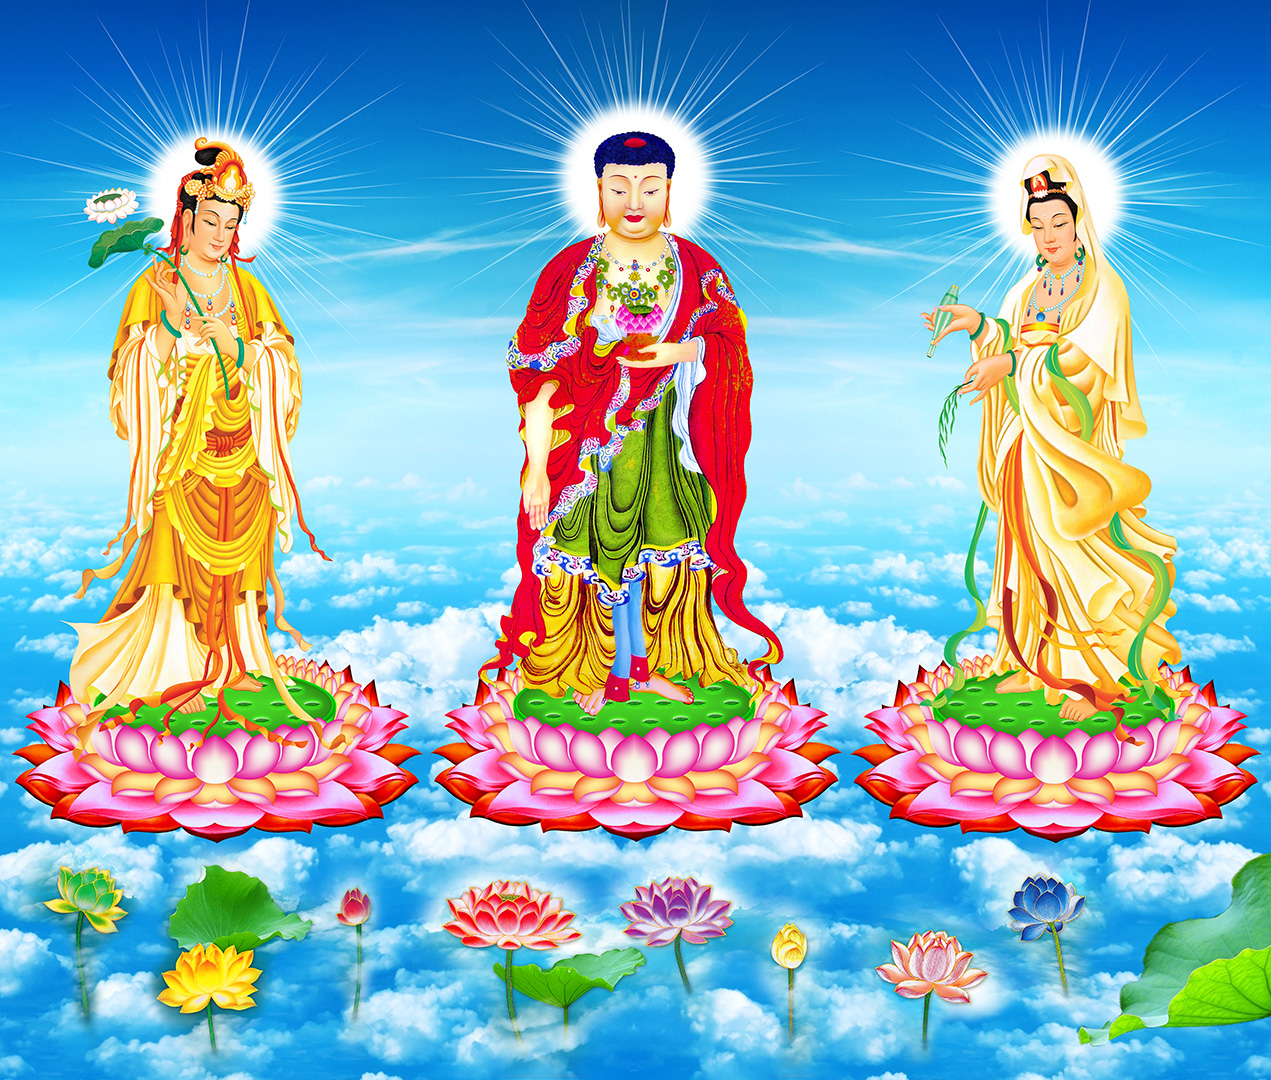 Tay-Phuong-Tam-Thanh-02